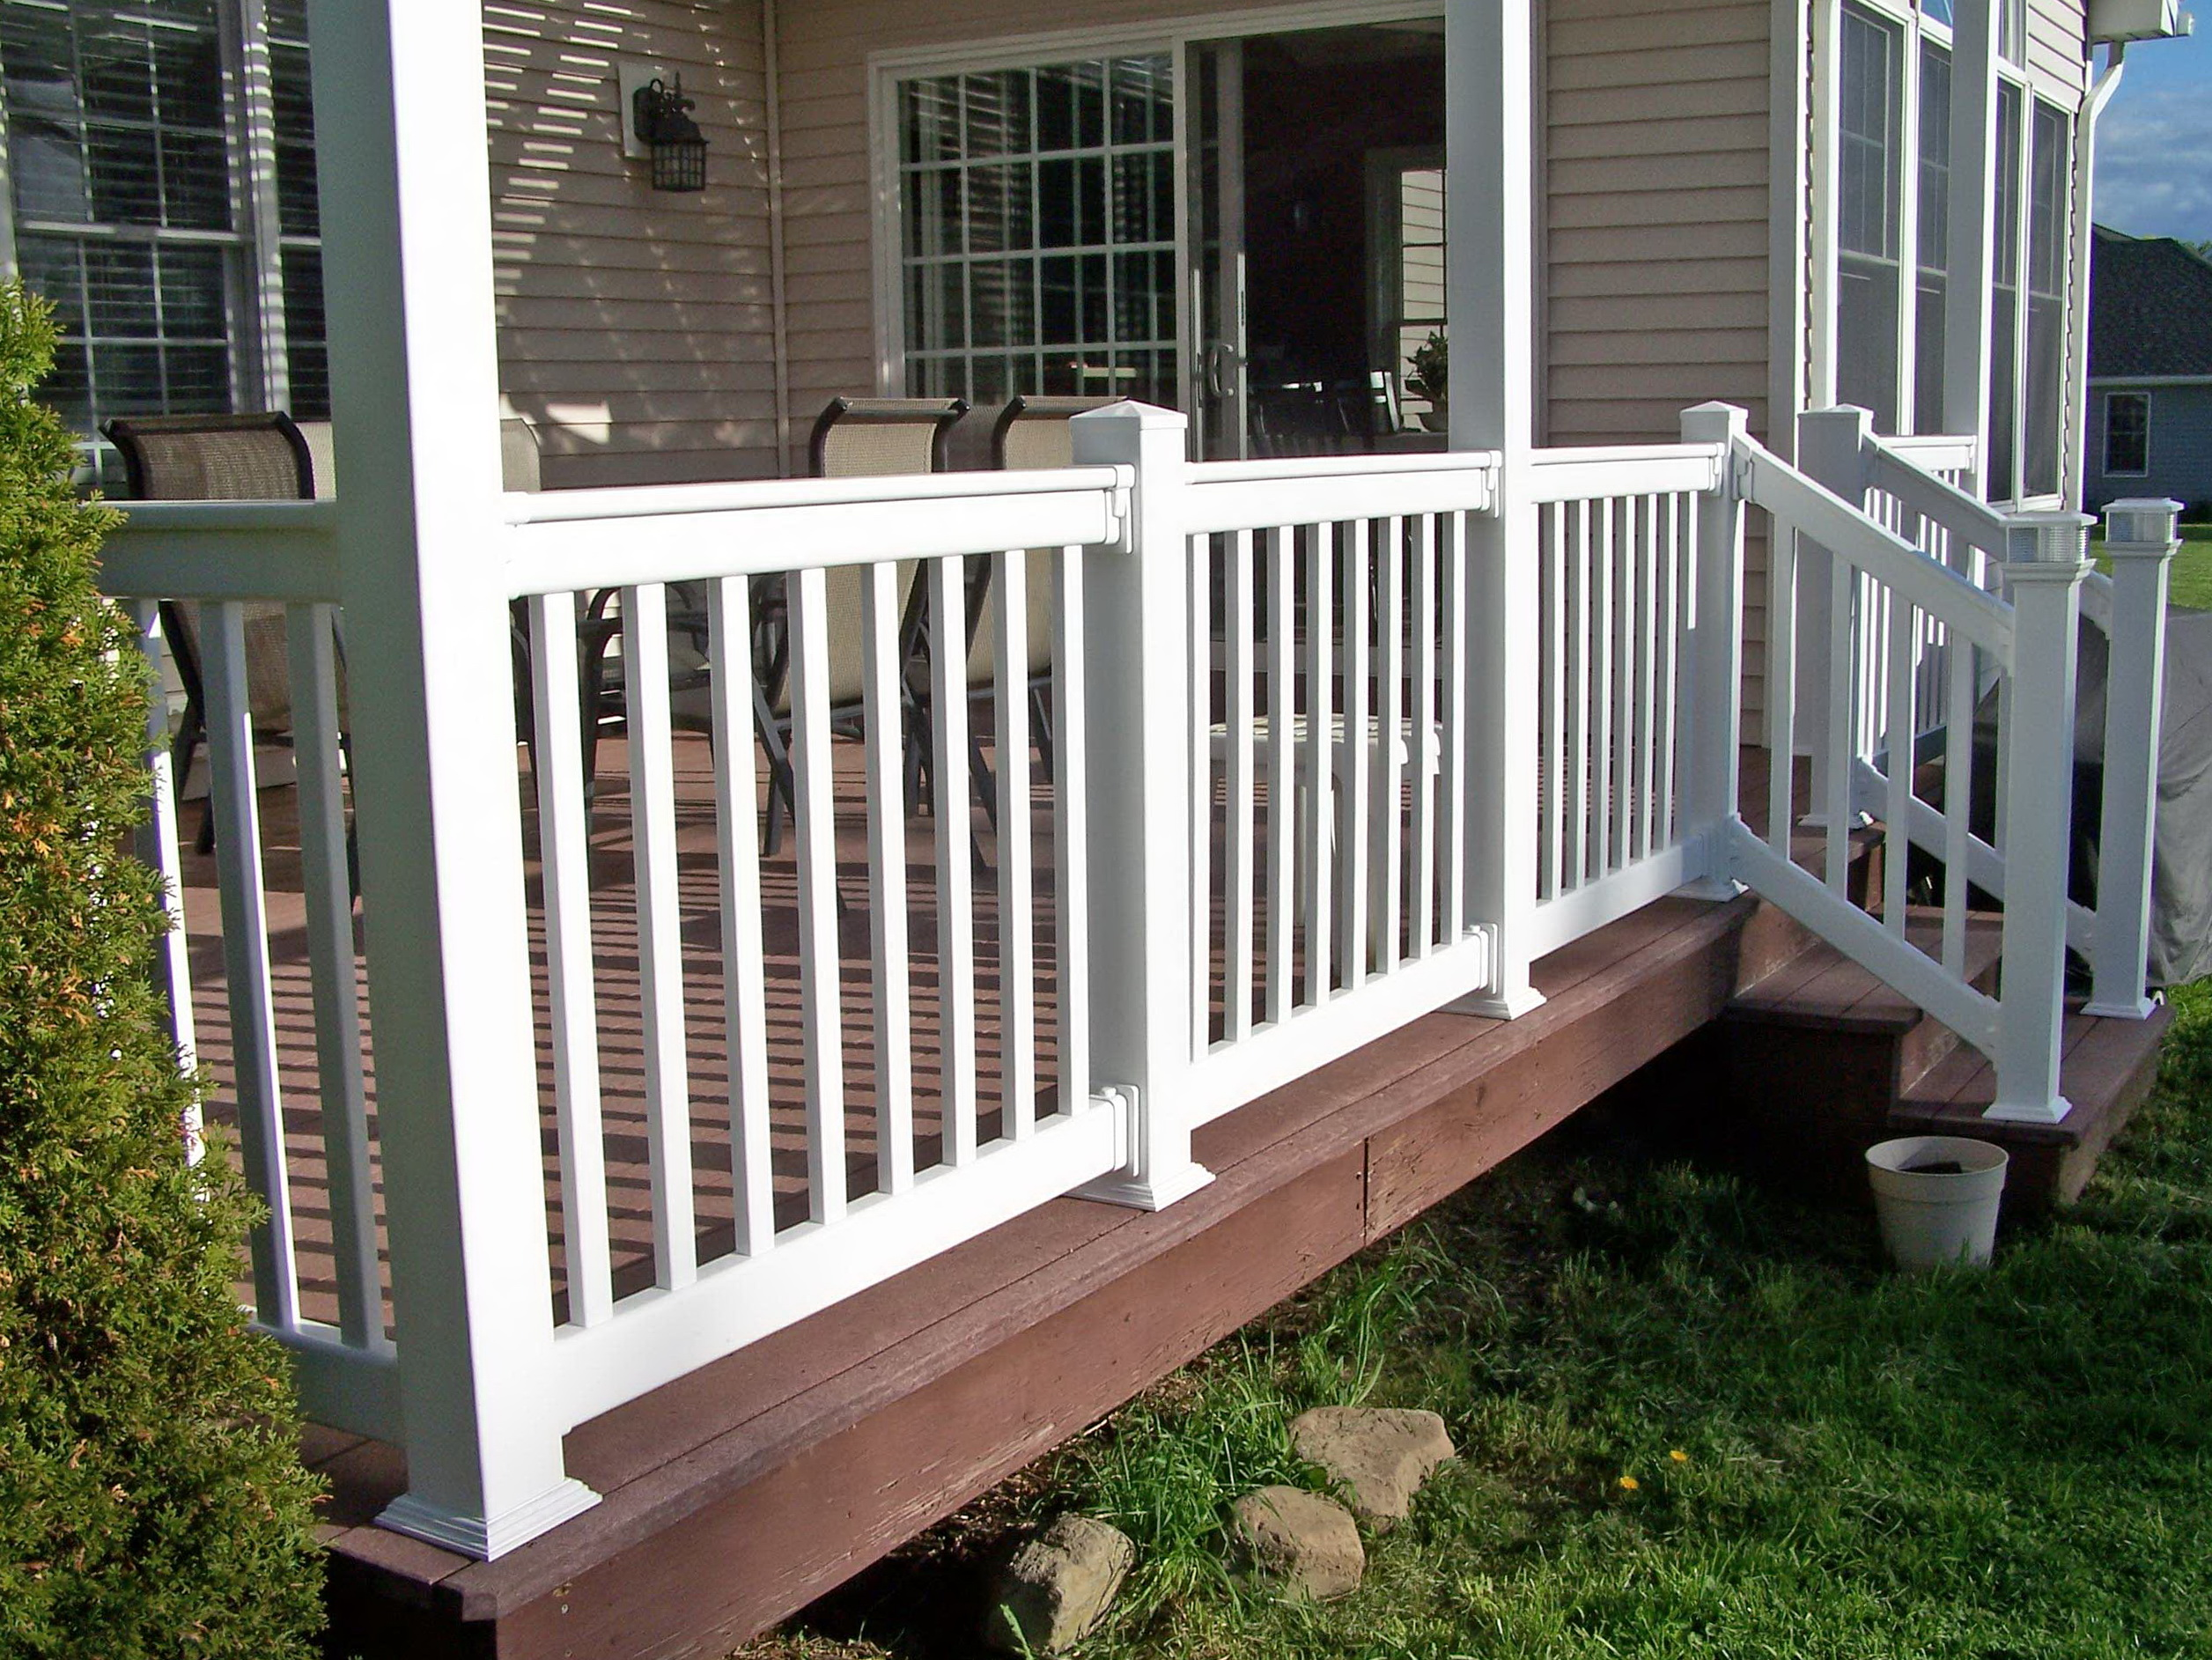 Pvc Porch Railing Lowes | Home Design Ideas